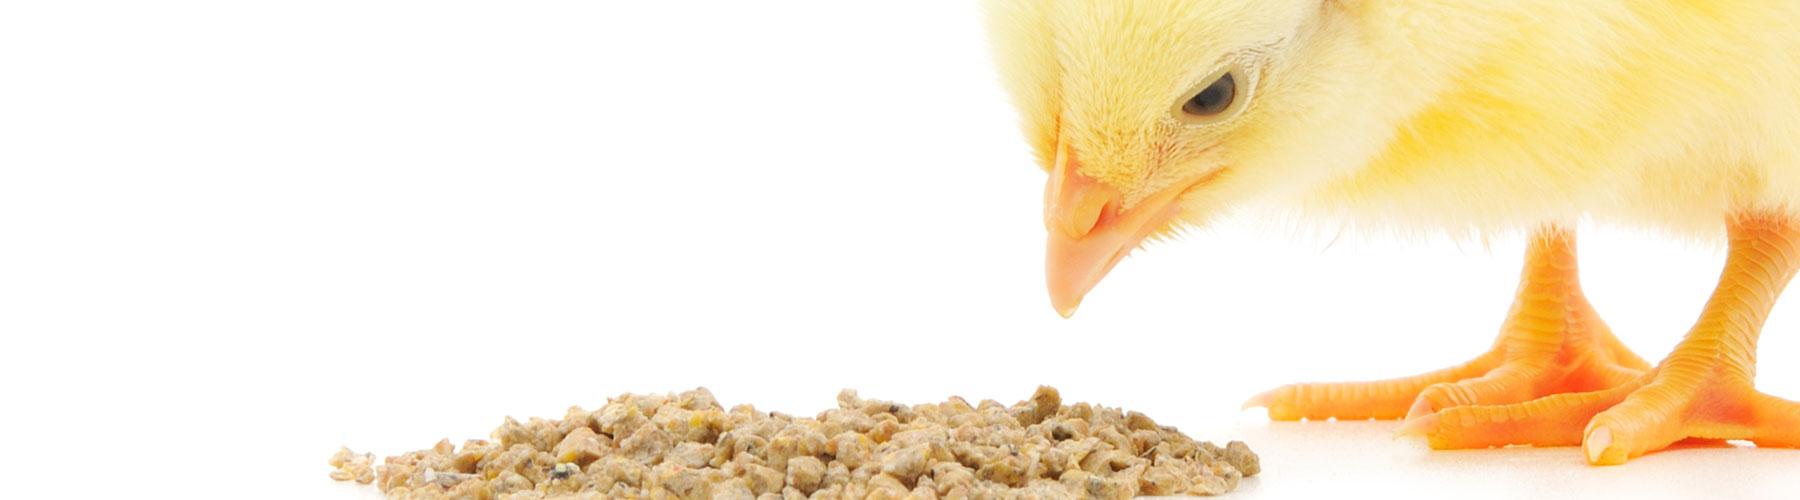 animal_feed_milling